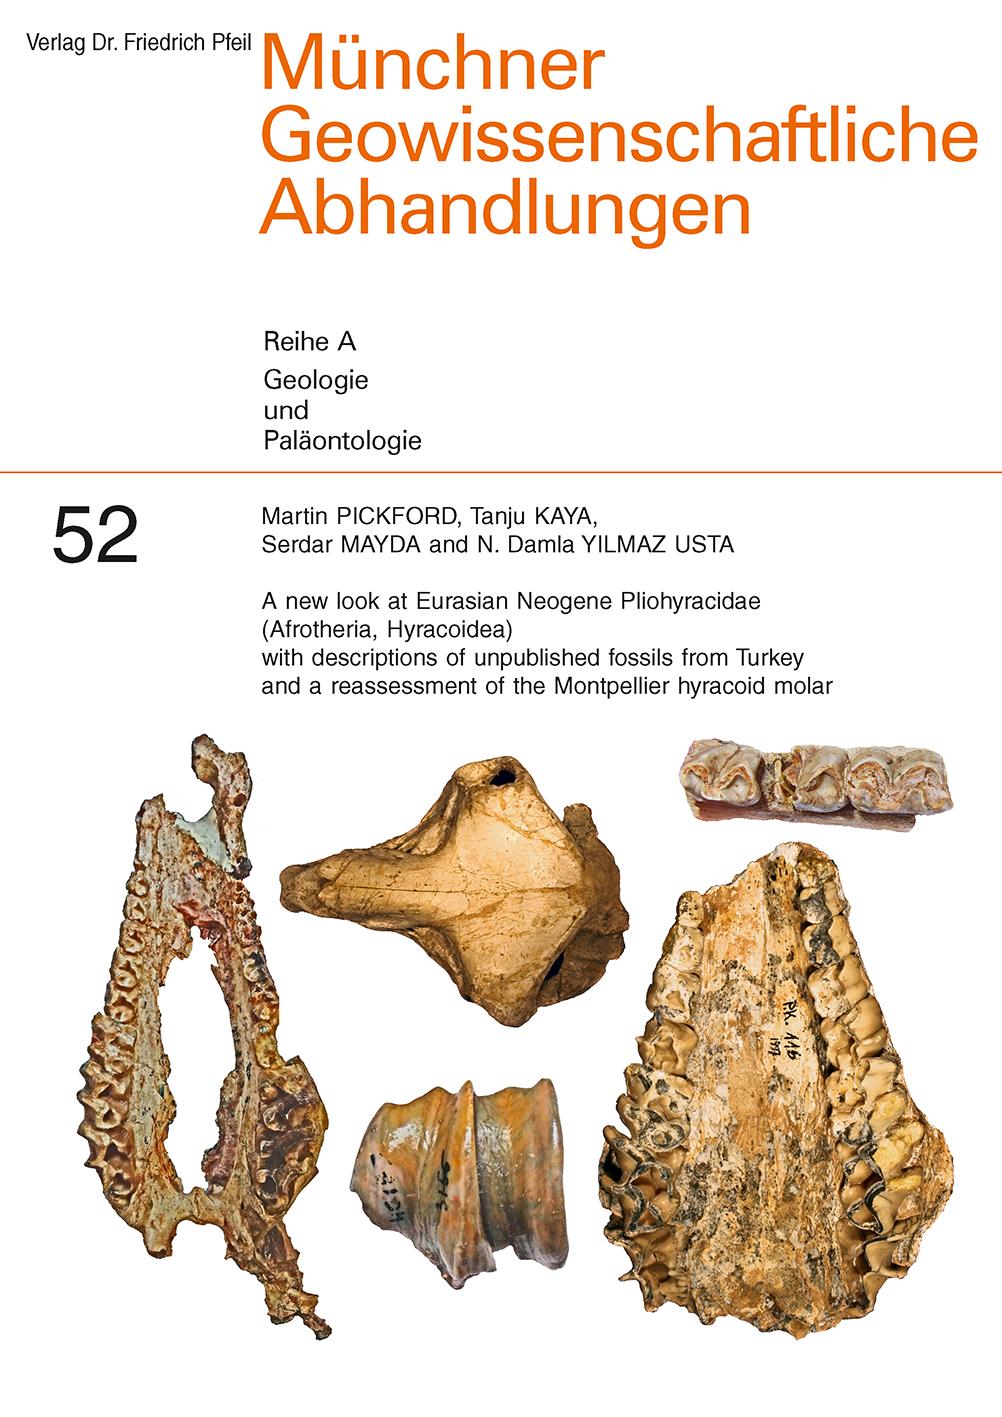 A new look at Eurasian Neogene Pliohyracidae